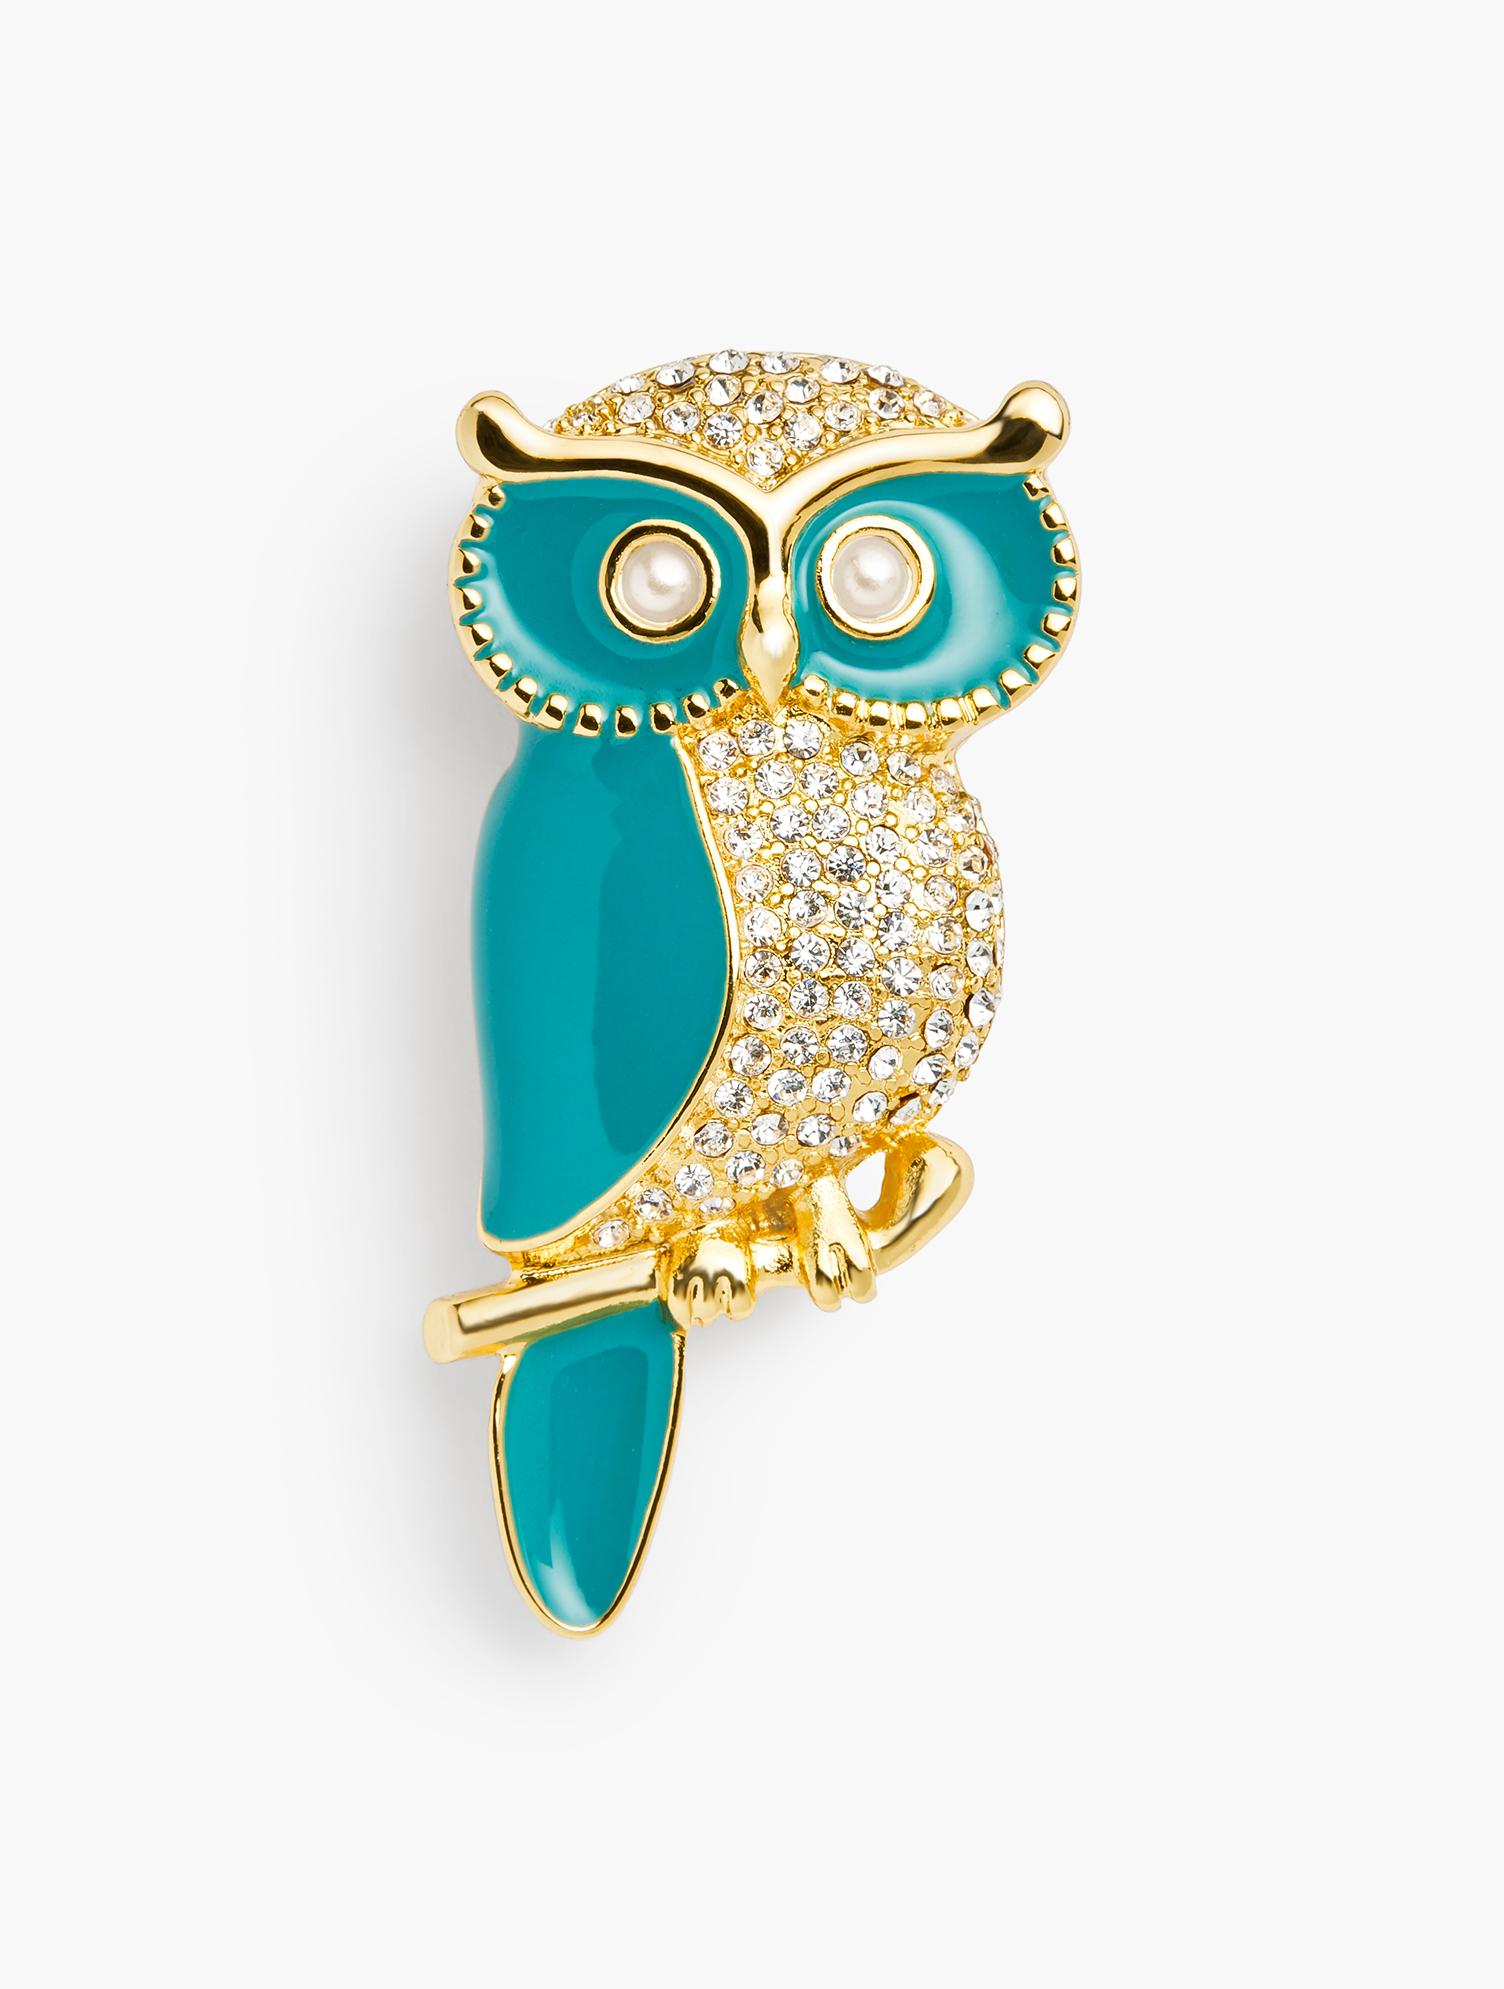 1940s Costume Jewelry: Necklaces, Earrings, Brooch, Bracelets Enamel Owl Brooch - TEAL-BLUEGOLD - OS - Talbots $49.50 AT vintagedancer.com